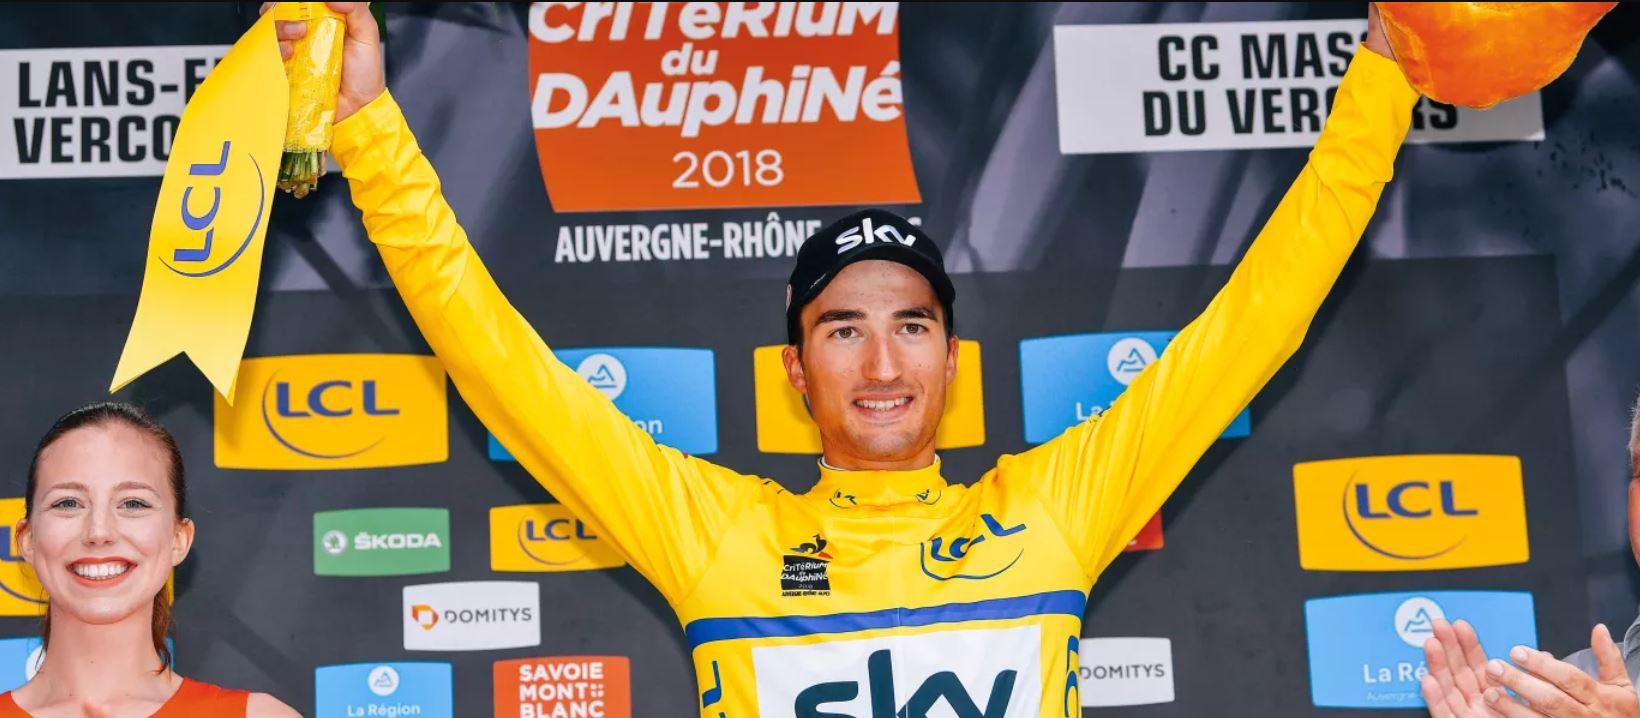 Gianni Moscon leader dopo la  quarta tappa del  Critérium du Dauphiné 2018